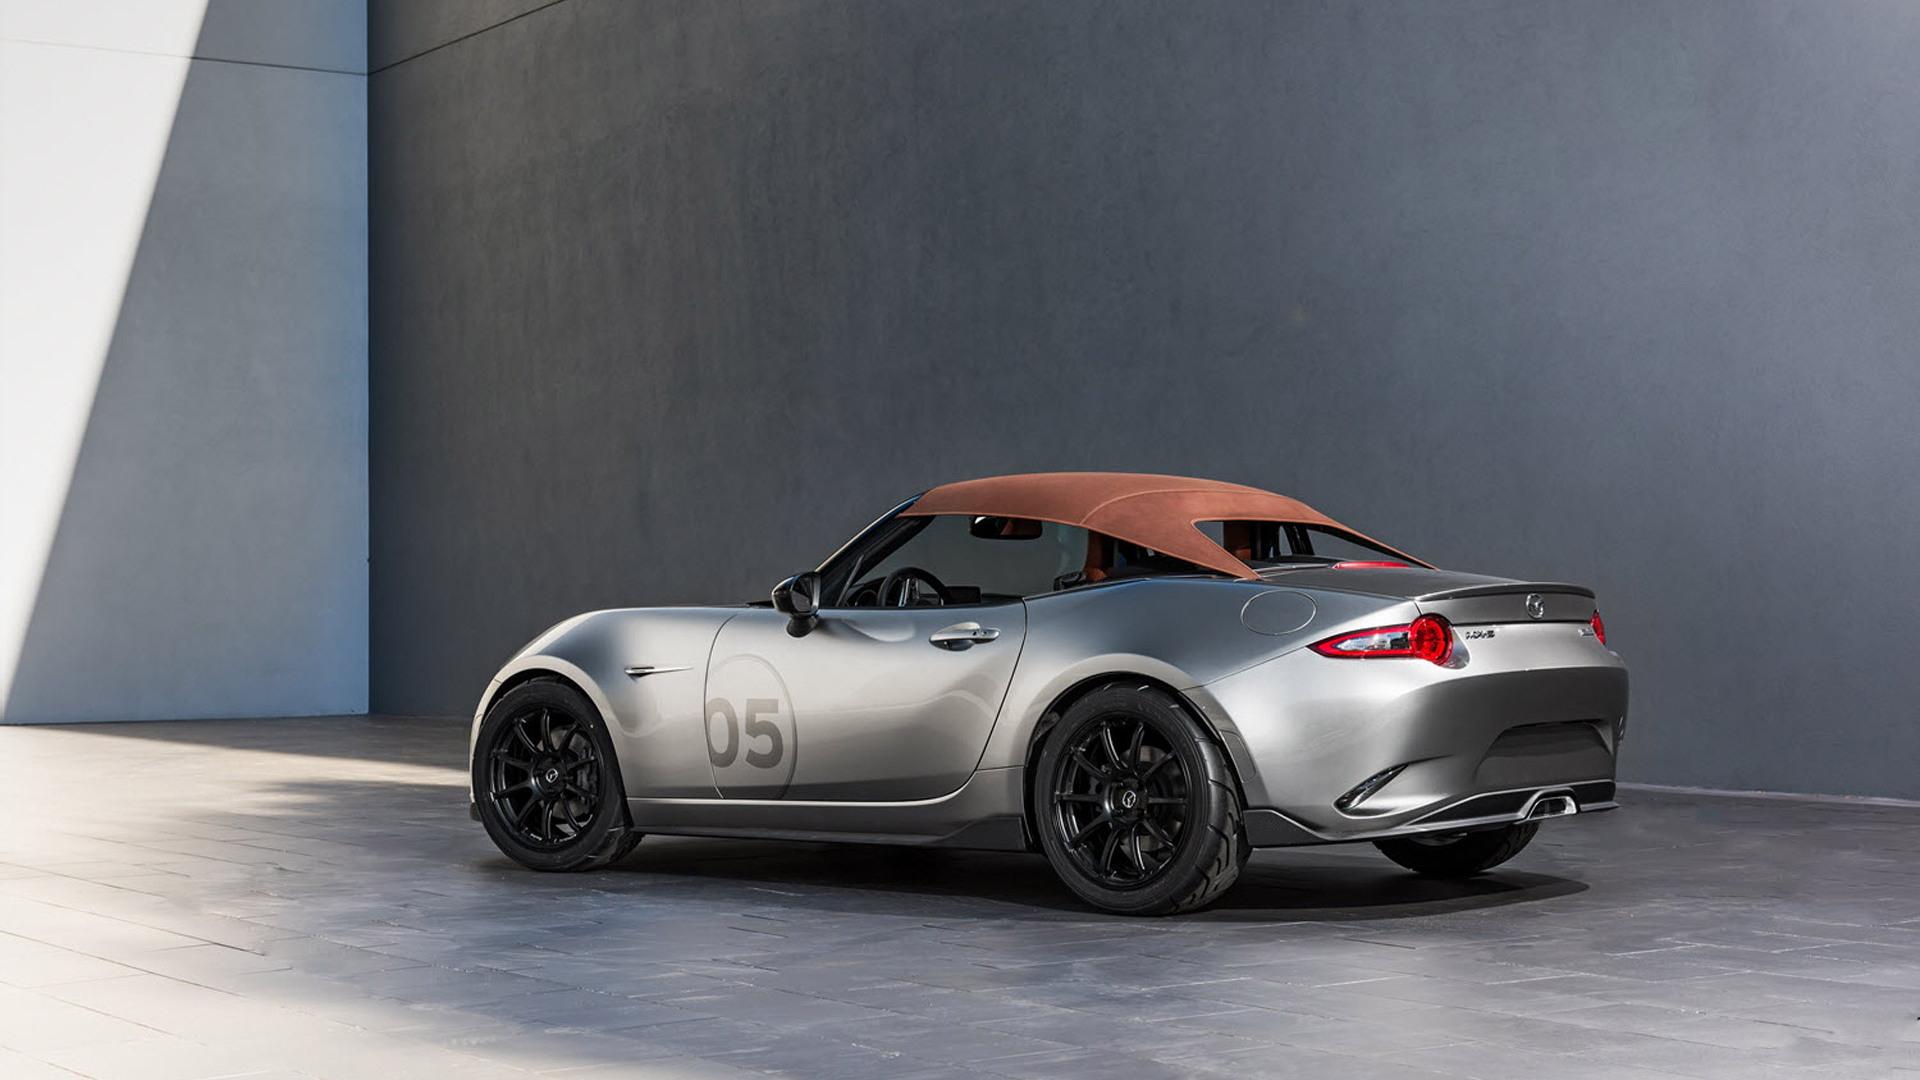 Mazda MX-5 Spyder concept, 2015 SEMA show